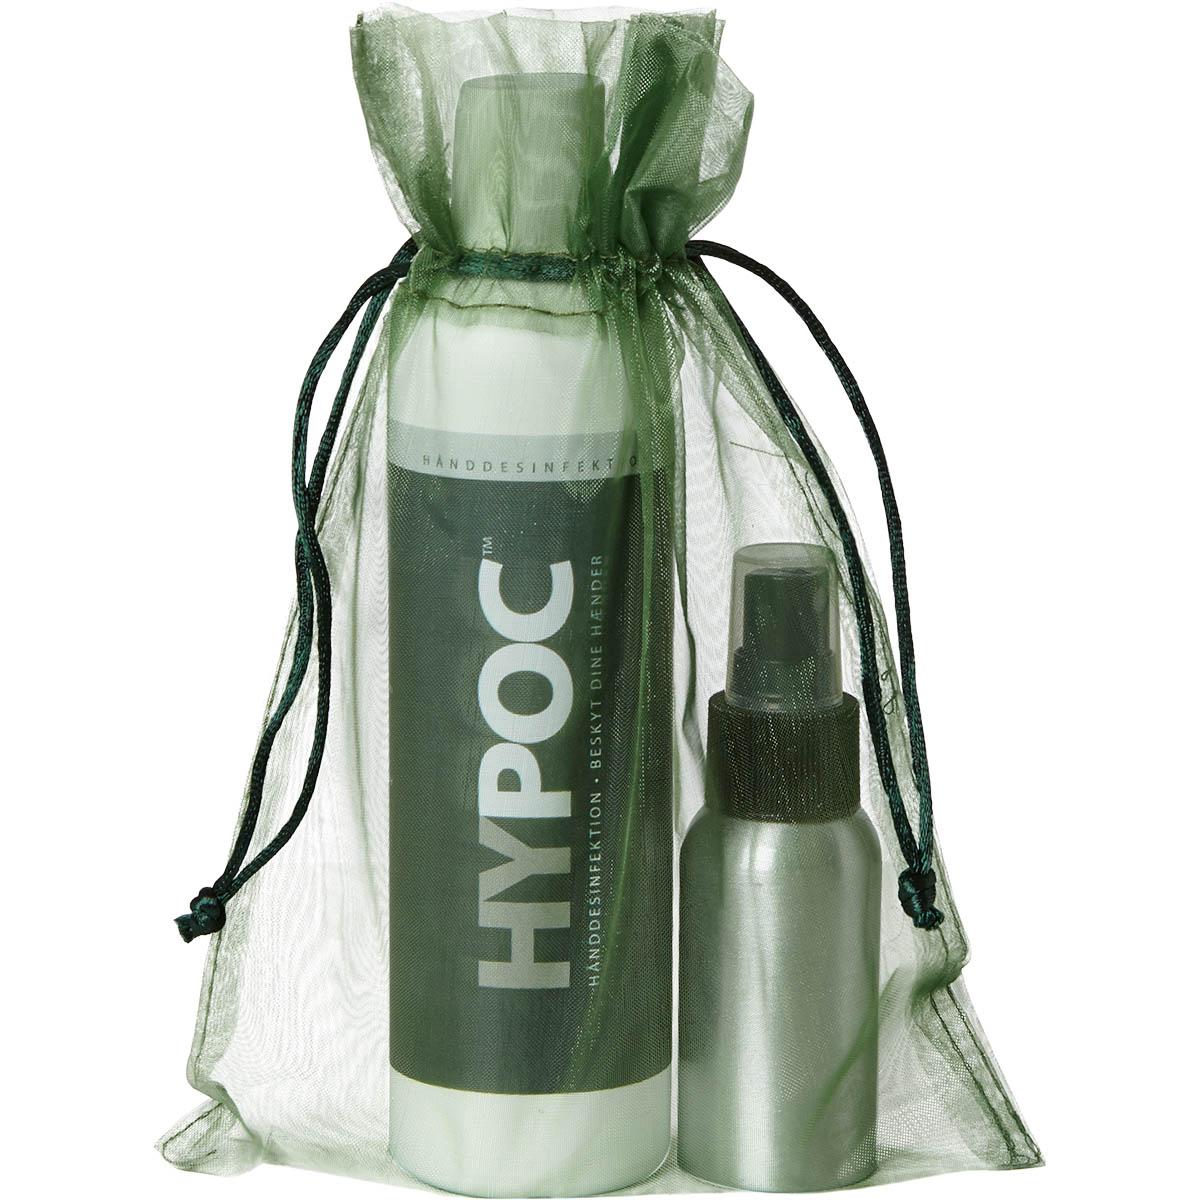 HYPOC Hånddesinfektion 50 ml Sprayflaske + 250 ml Refill